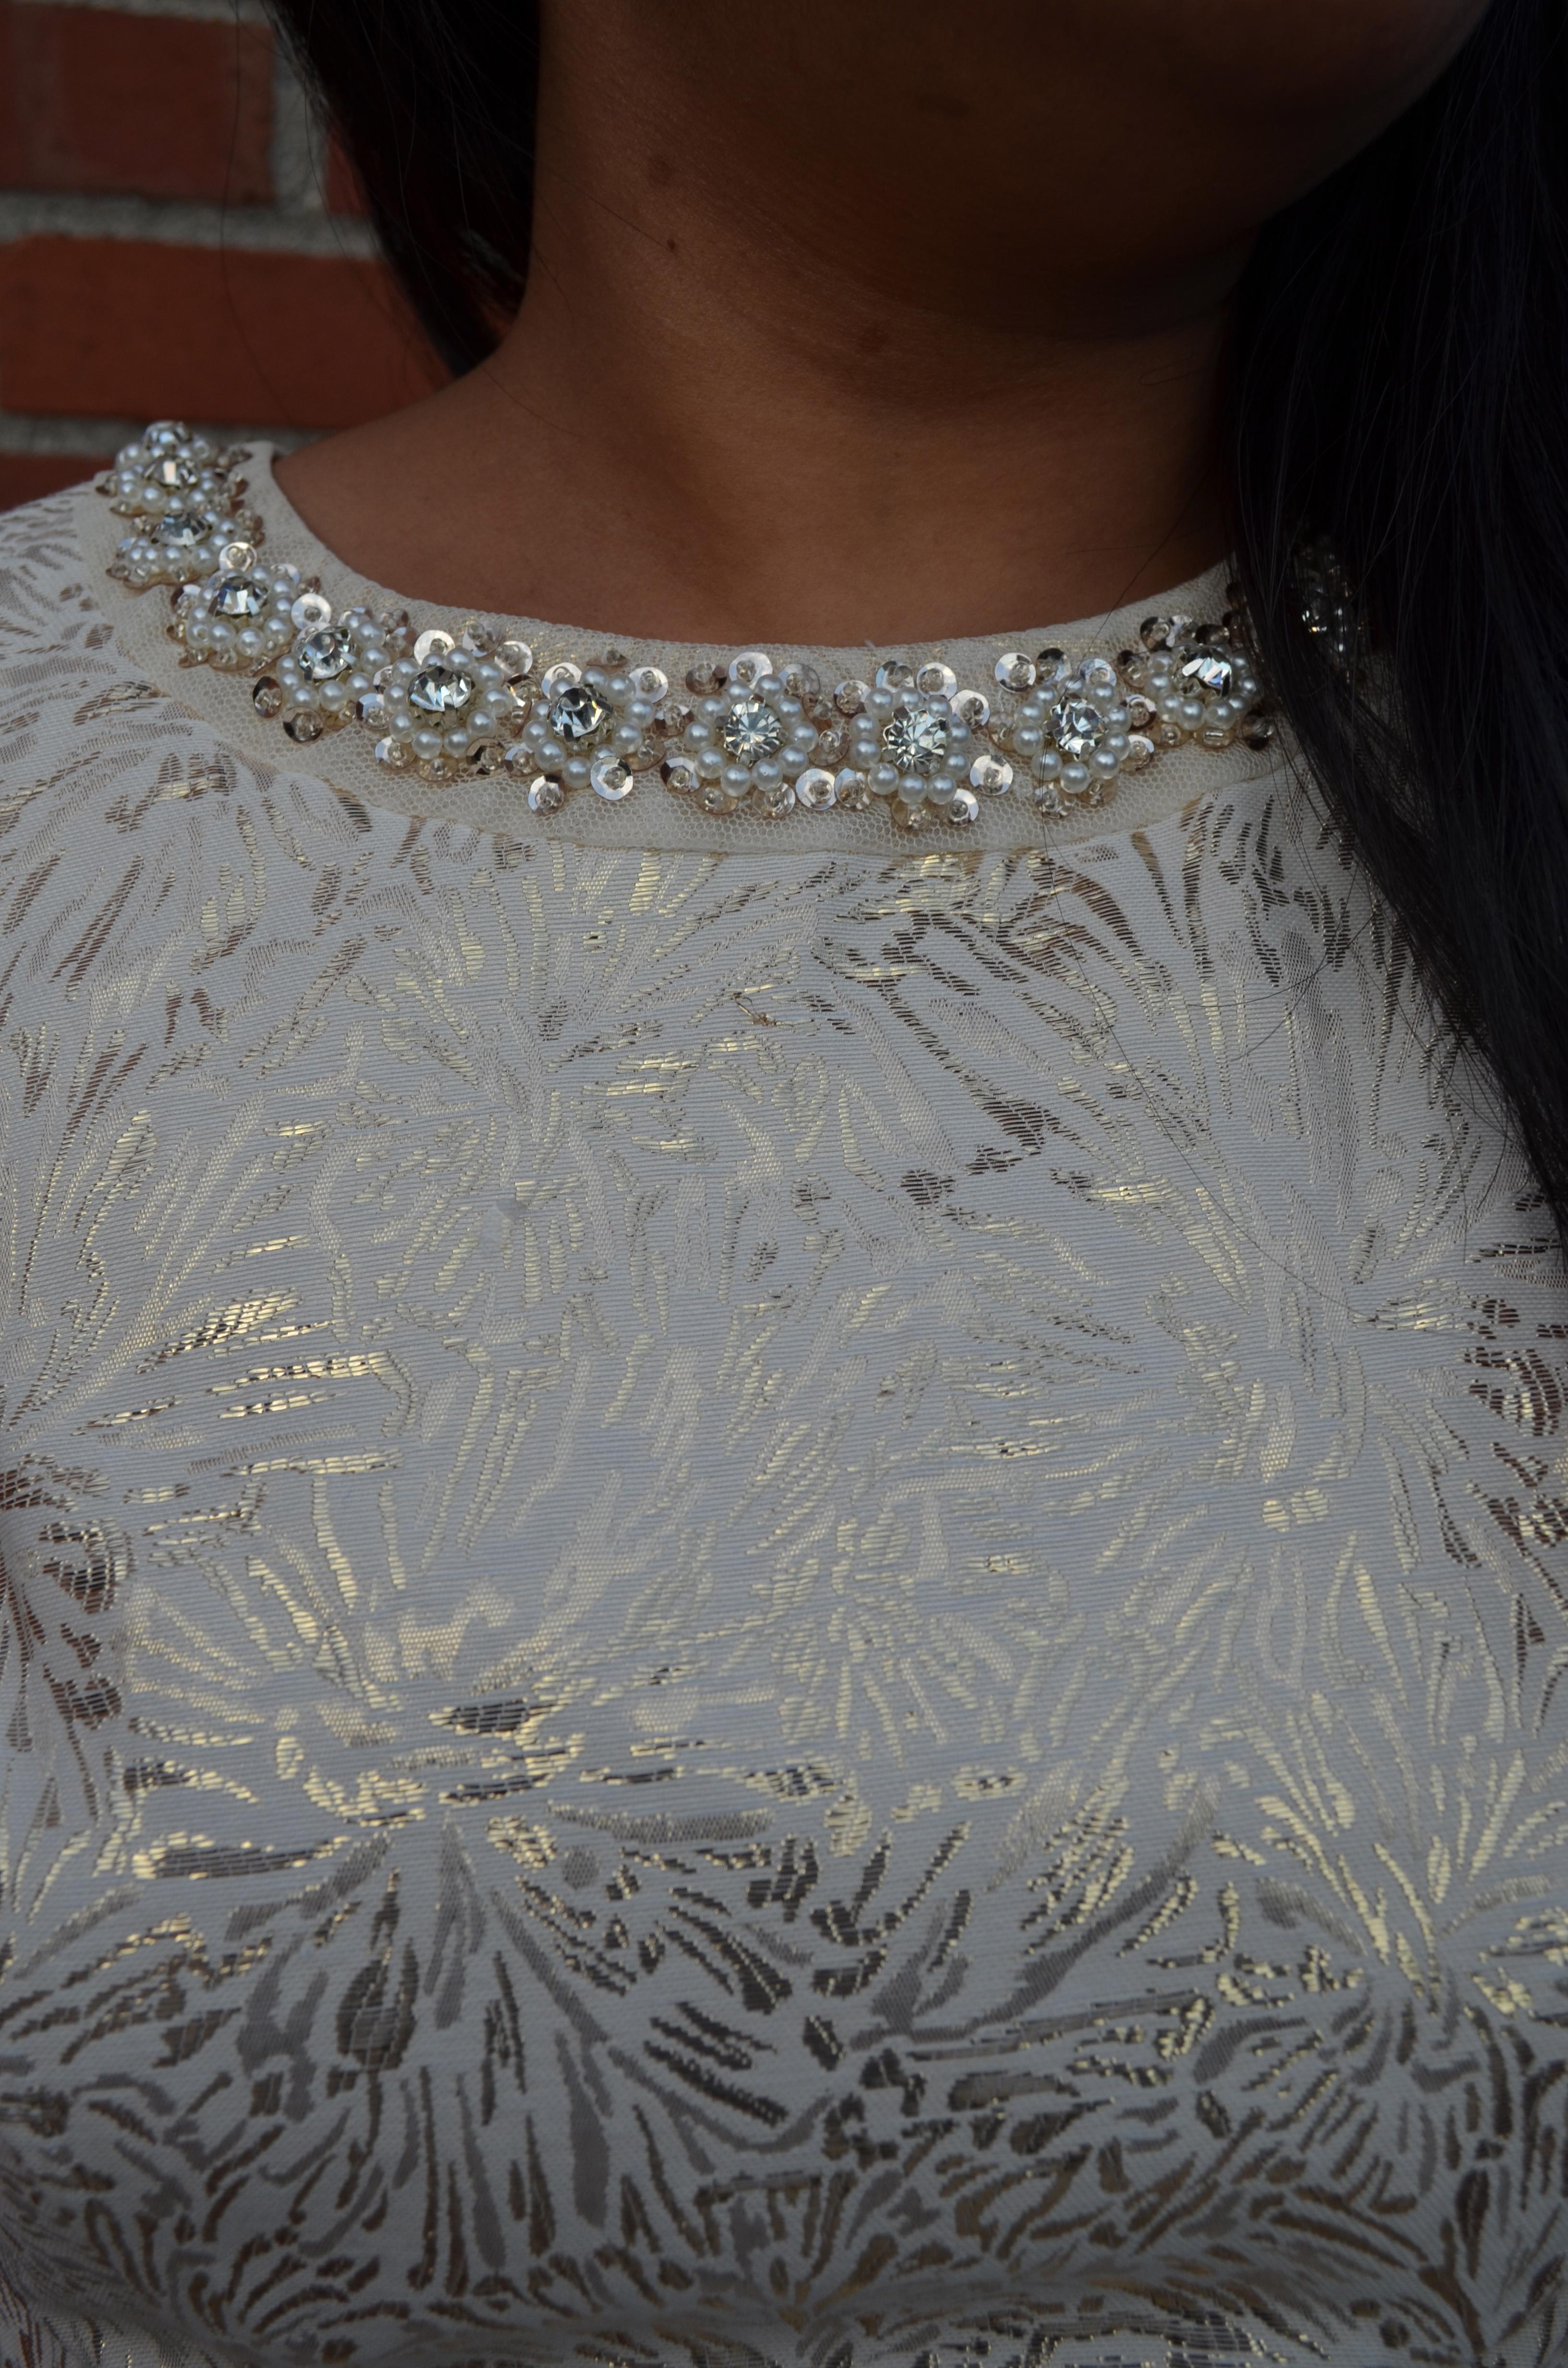 Bejeweled Neck Dress